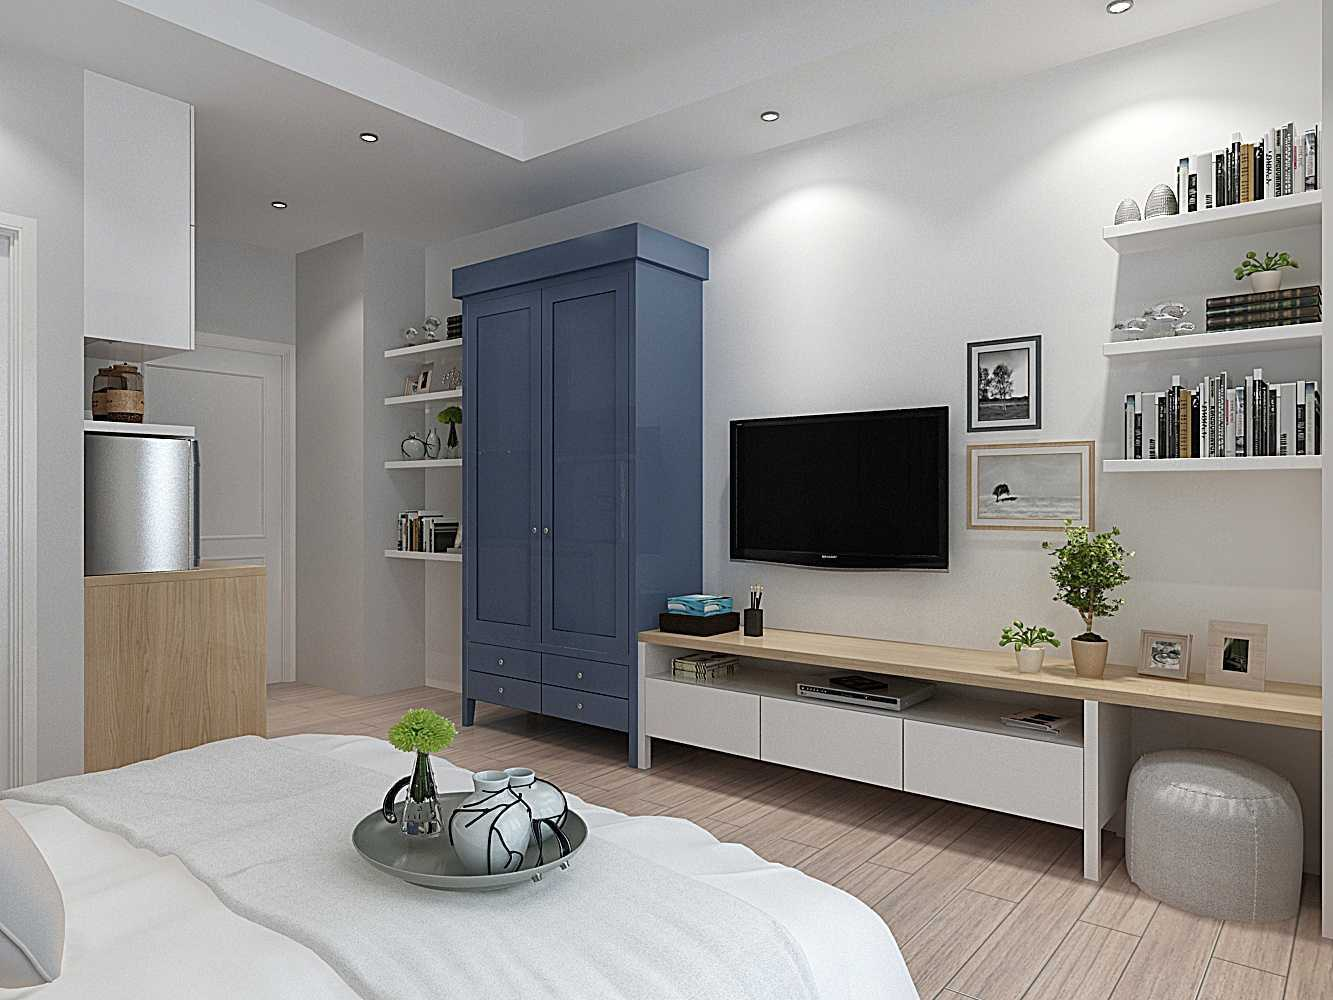 Tema Scandinavian pada Scandinavian Studio Apartment karya 7Design Architect [Sumber: arsitag.com]